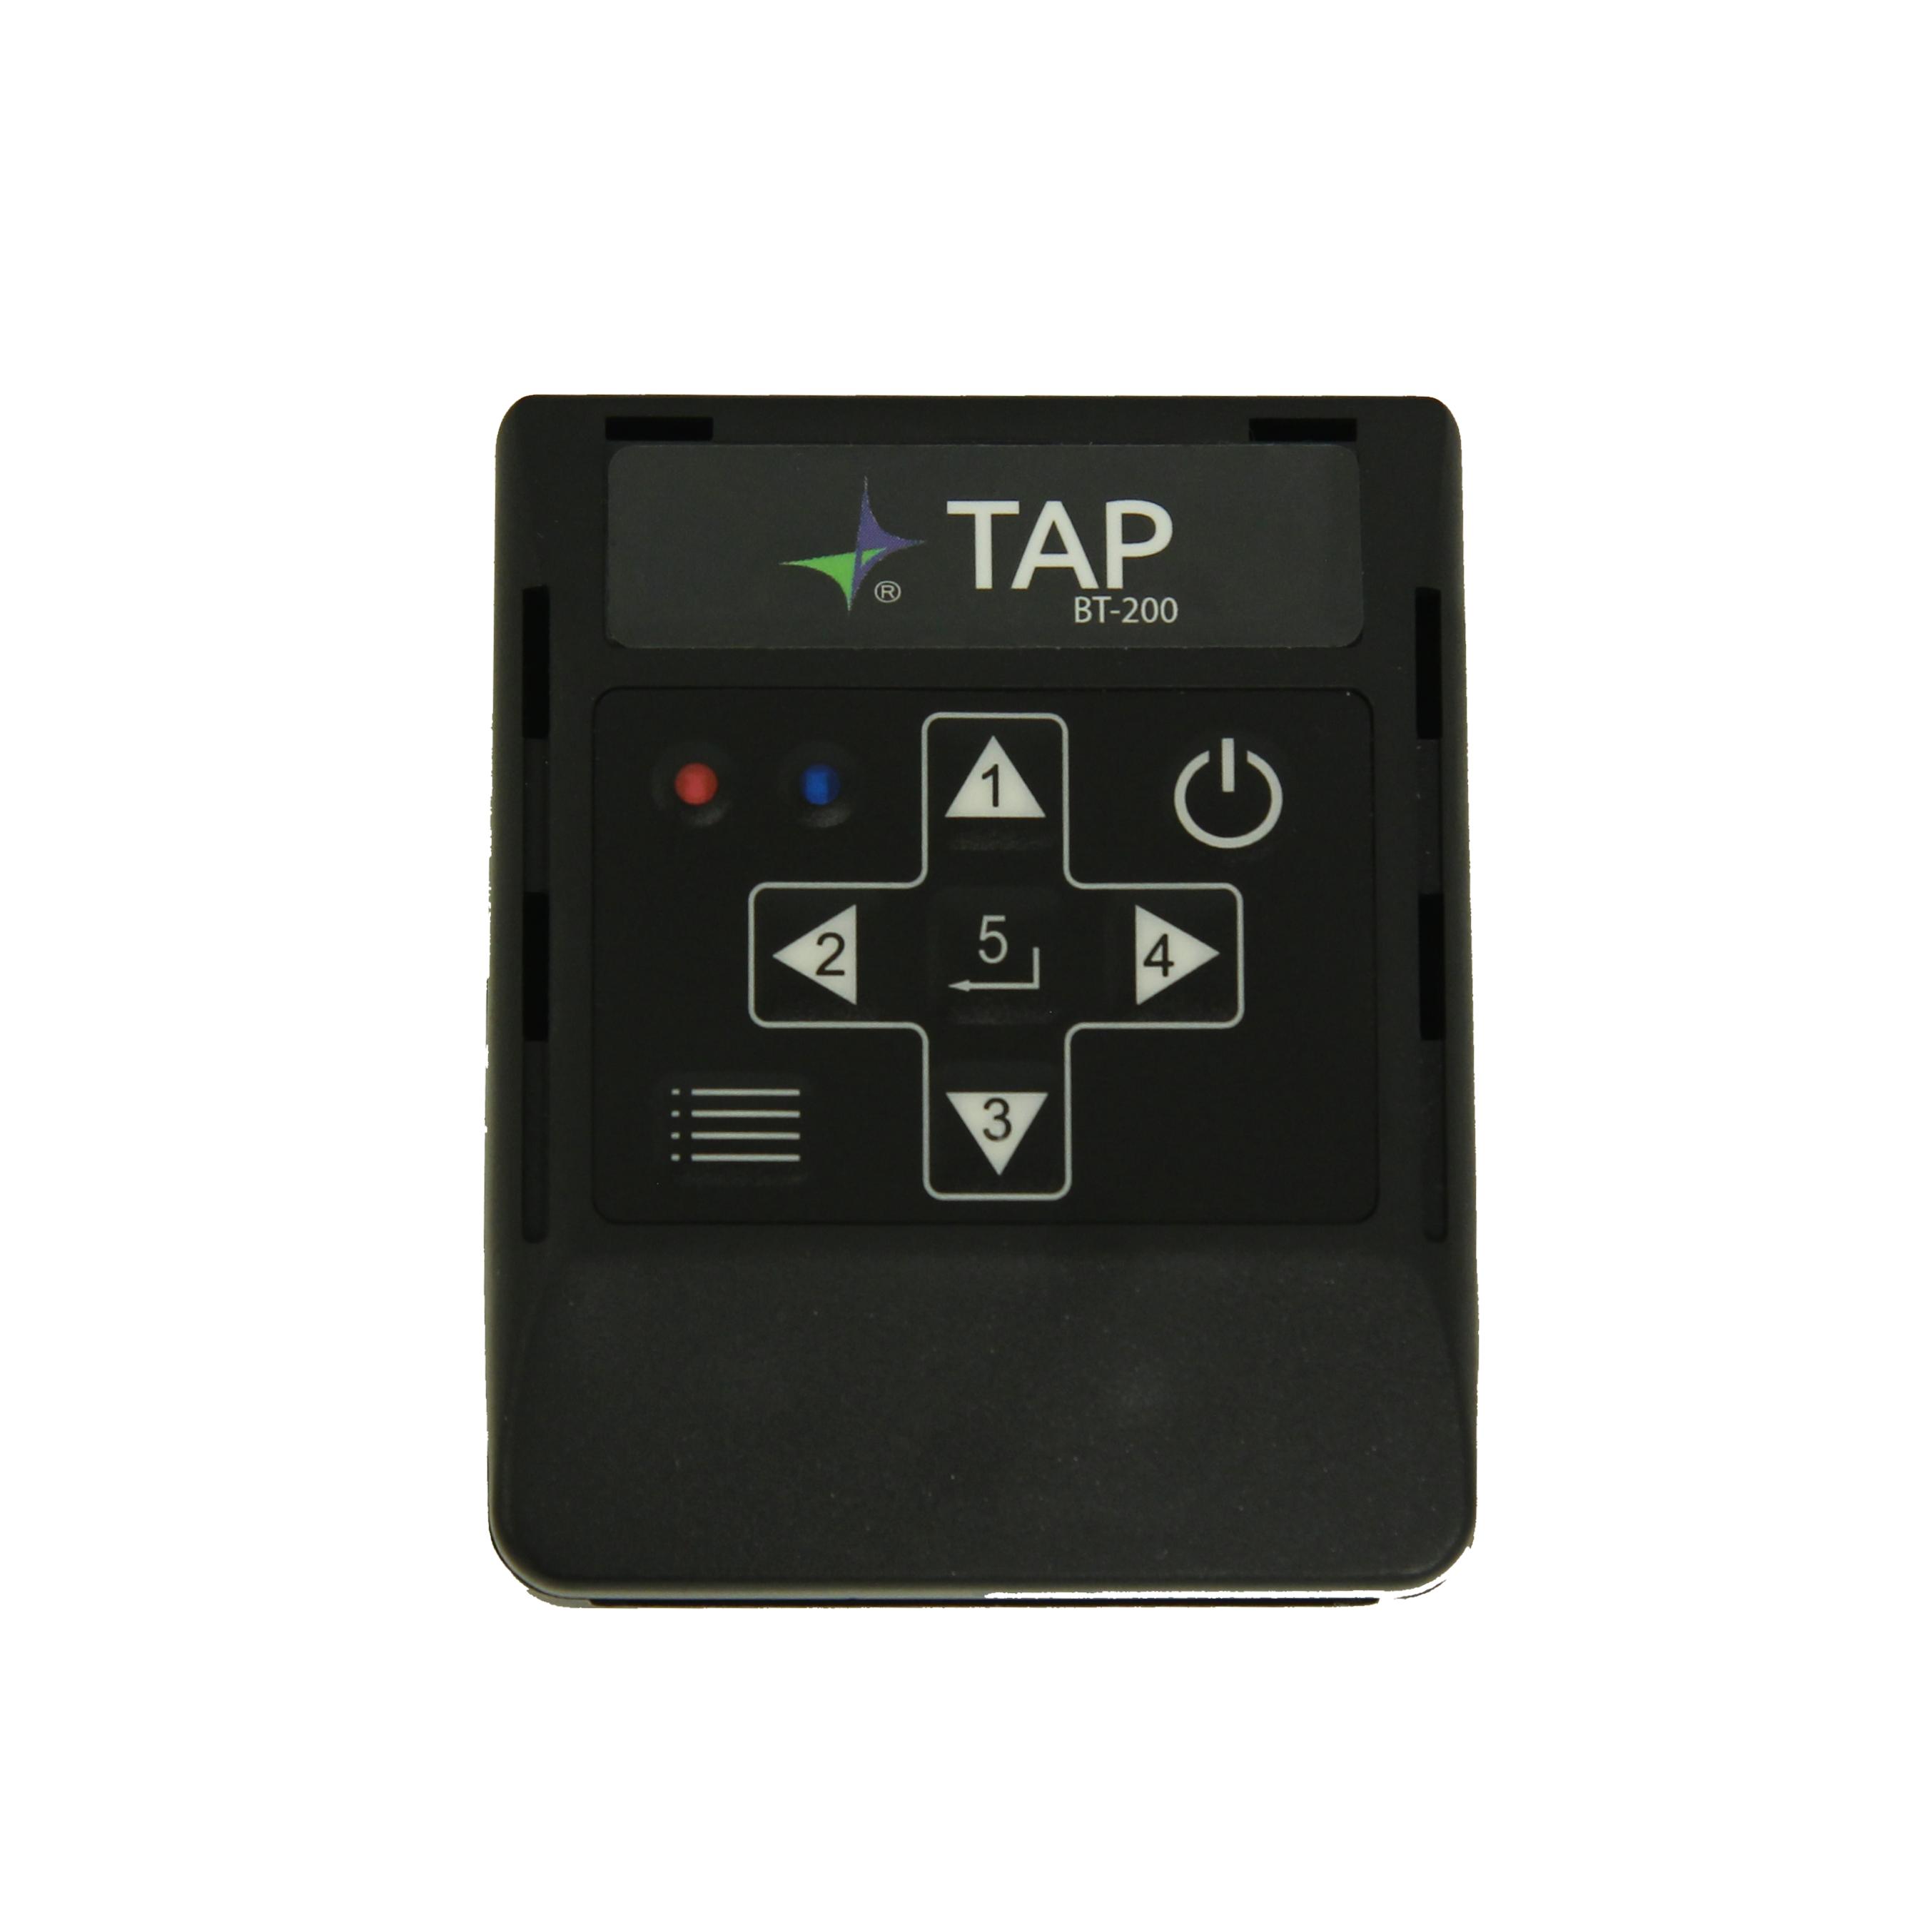 TAP Transceiver